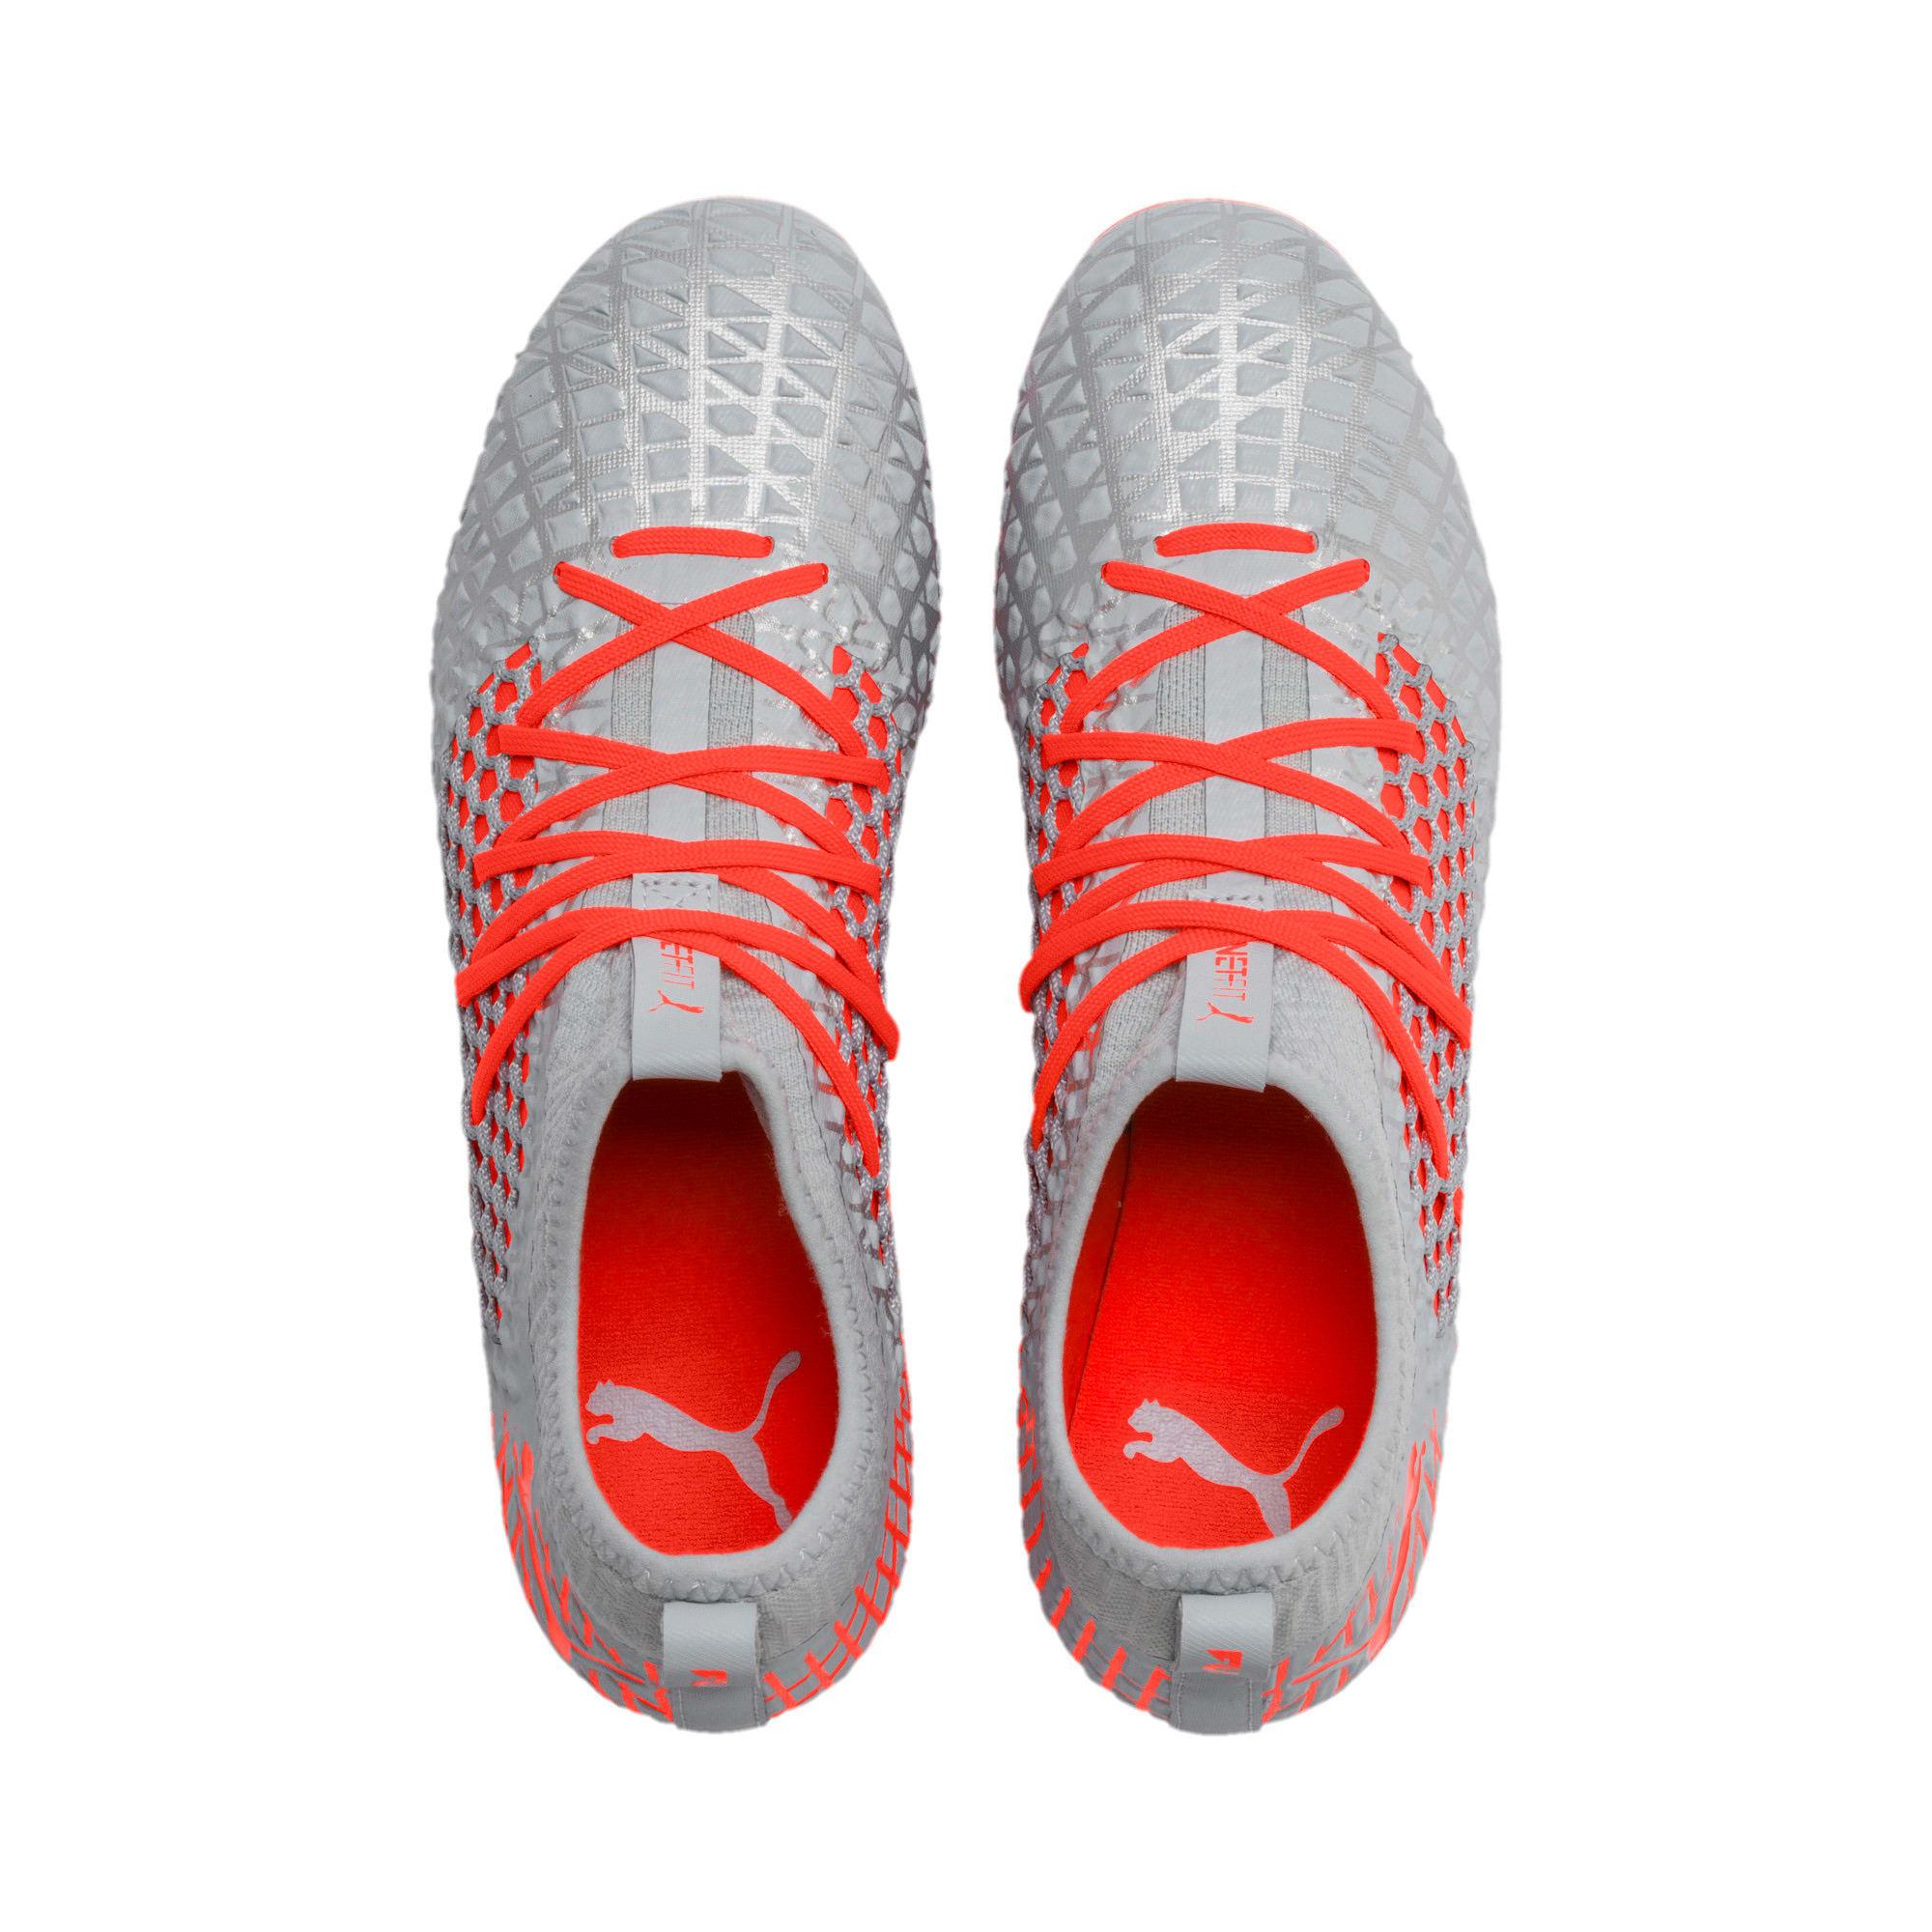 Thumbnail 7 of FUTURE 4.3 NETFIT FG/AG Men's Soccer Cleats, Glacial Blue-Nrgy Red, medium